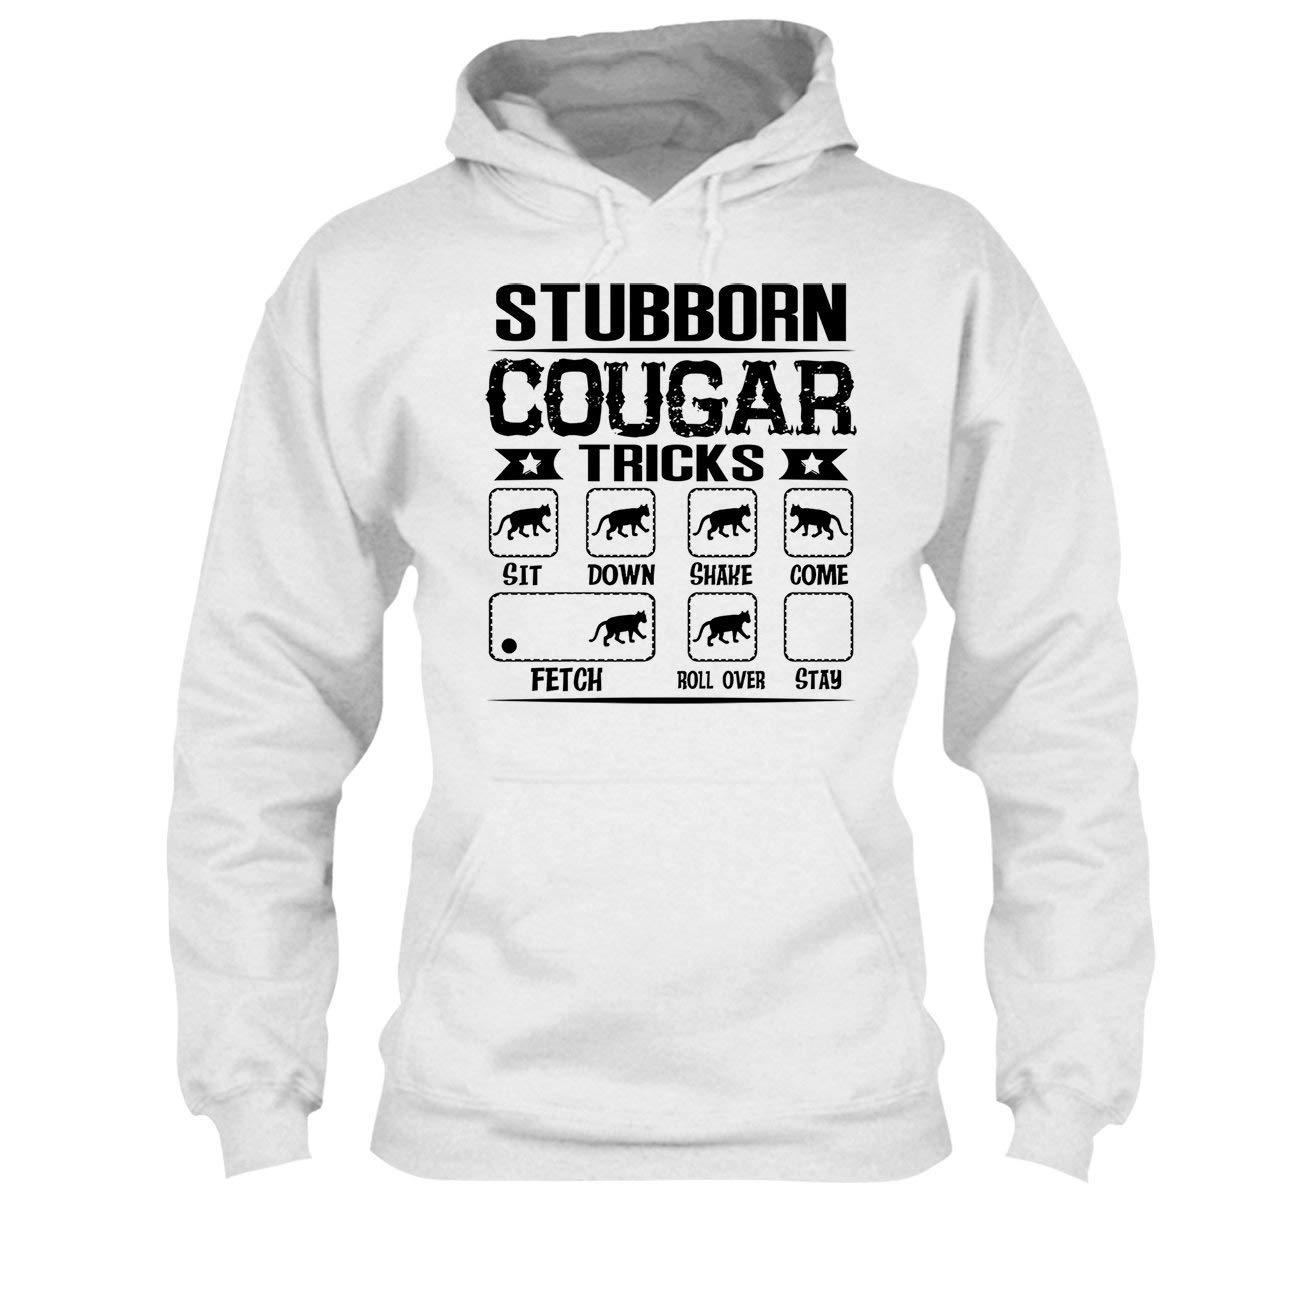 Stubborn Cougar Tricks Tee Shirt Design Long Sleeve Shirt